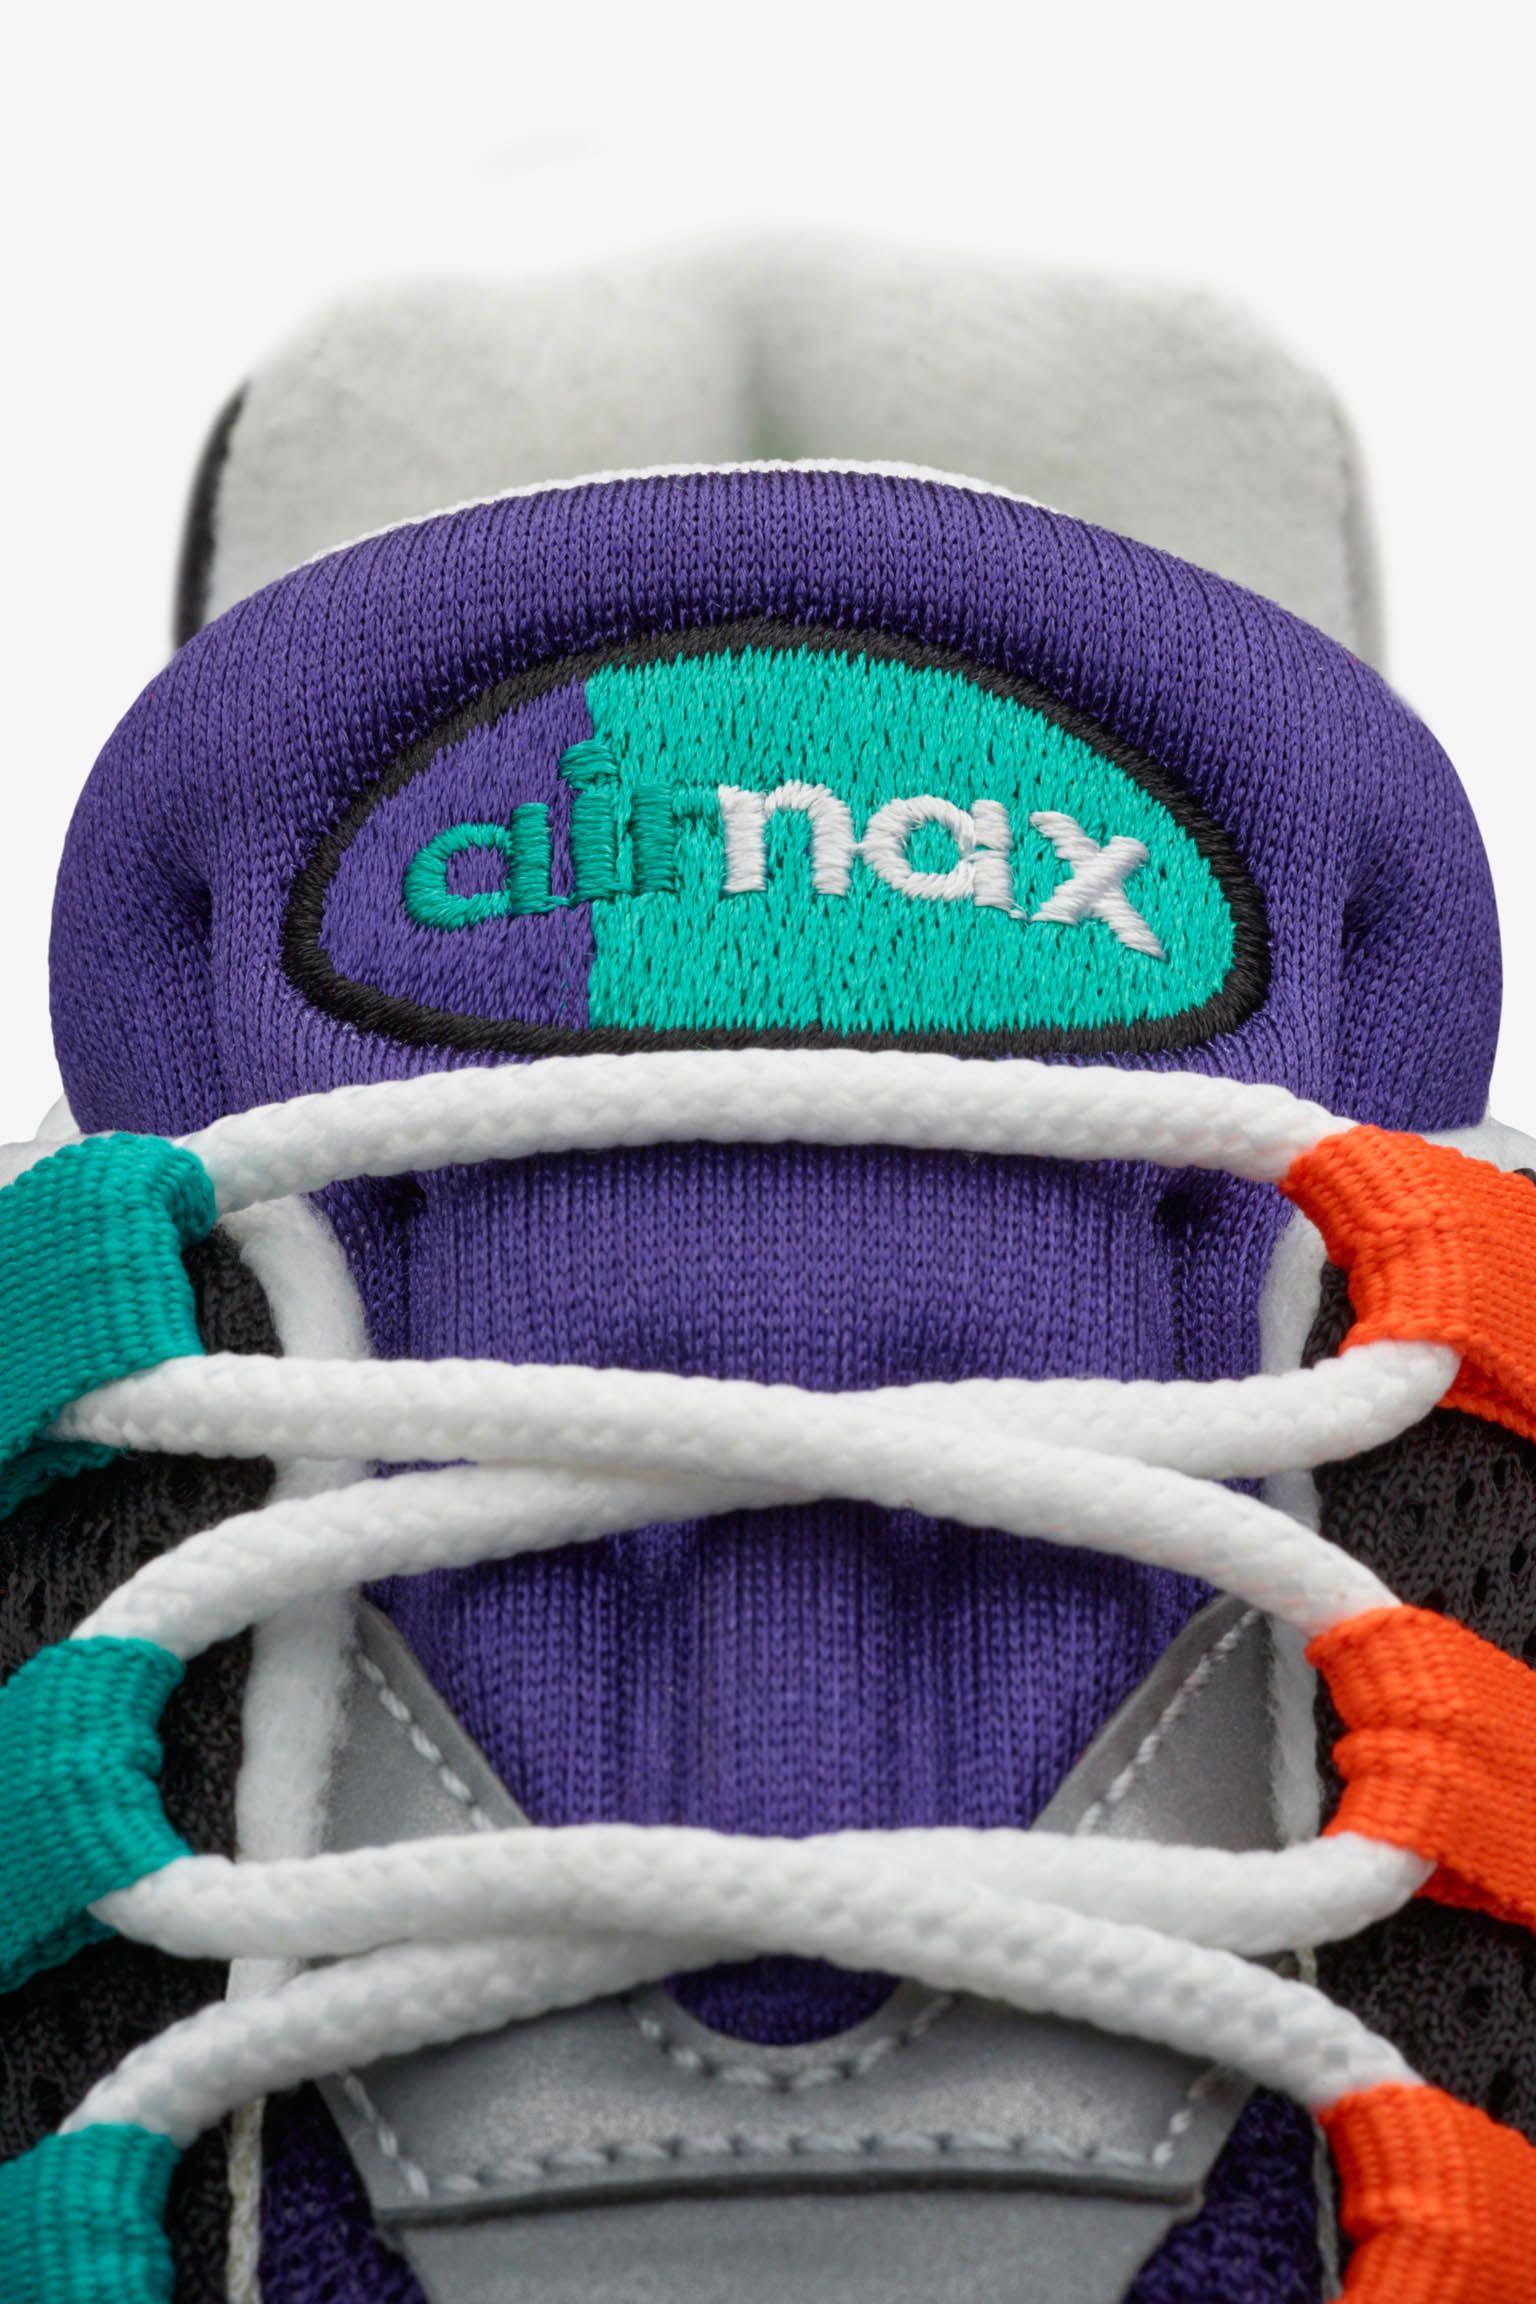 Nike Air Max 95 'Greedy'